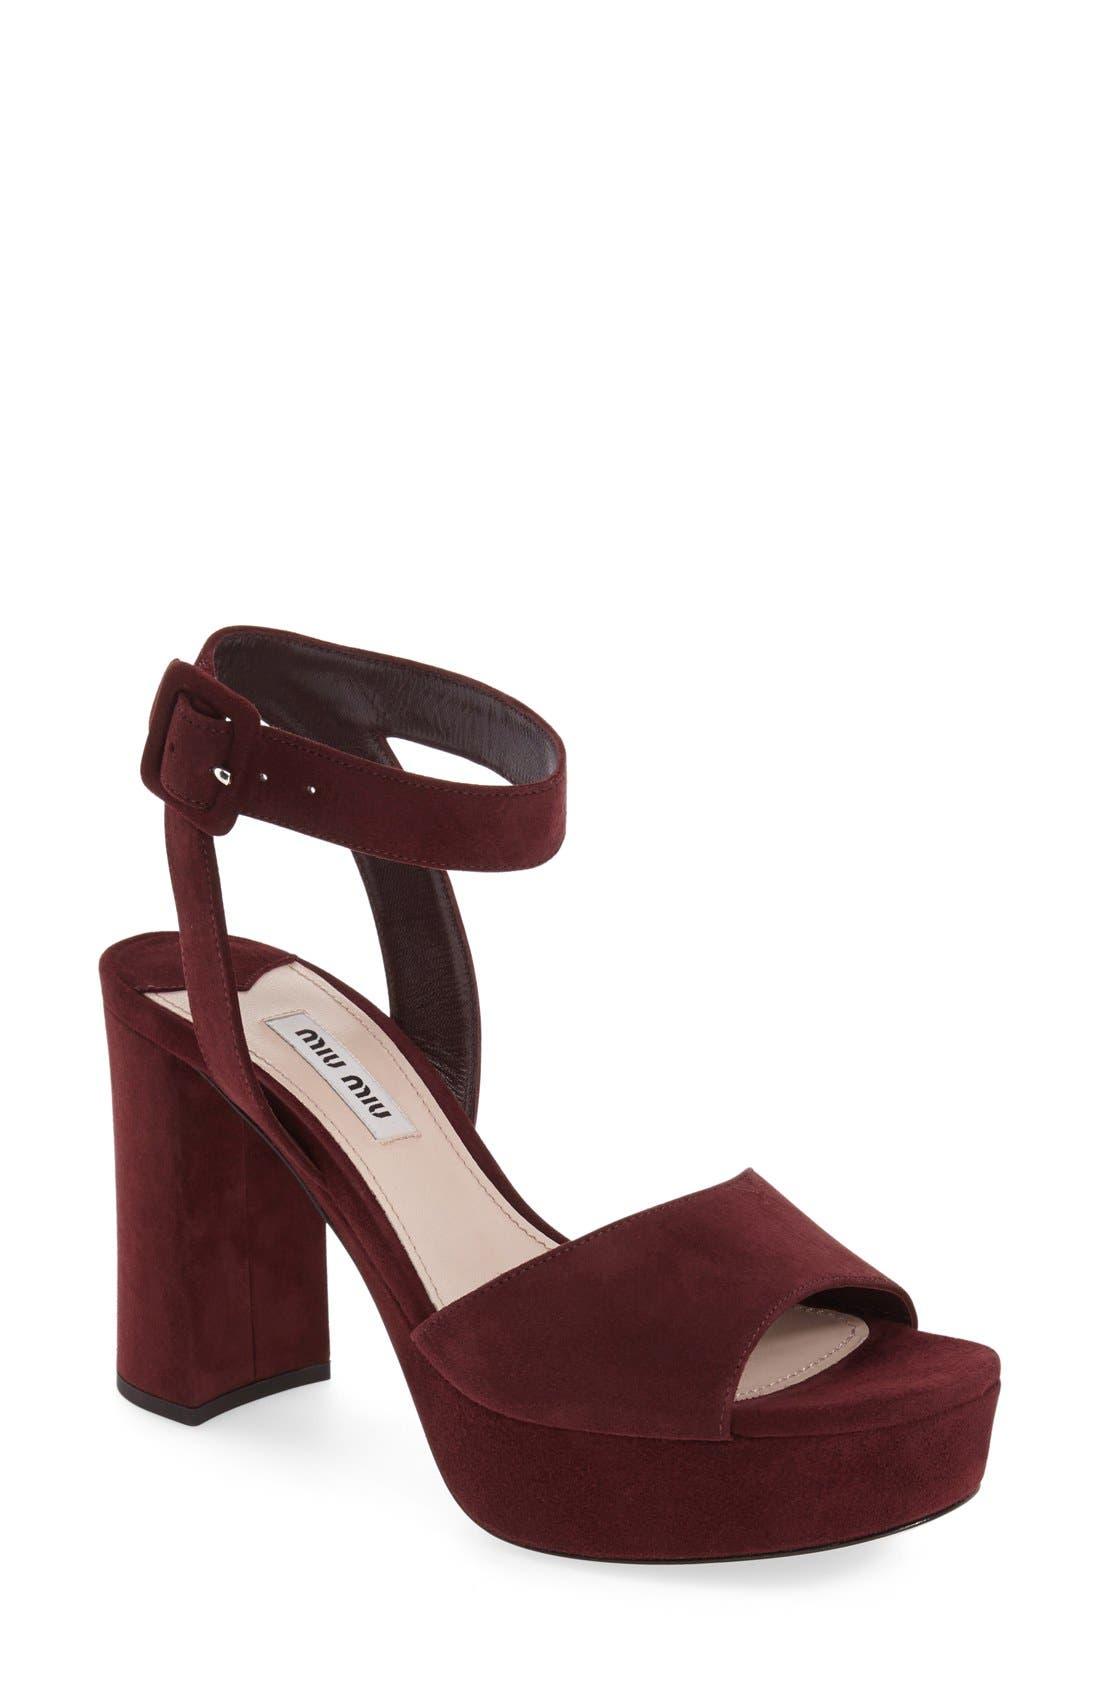 'Sandali' Ankle Strap Sandal,                             Main thumbnail 4, color,